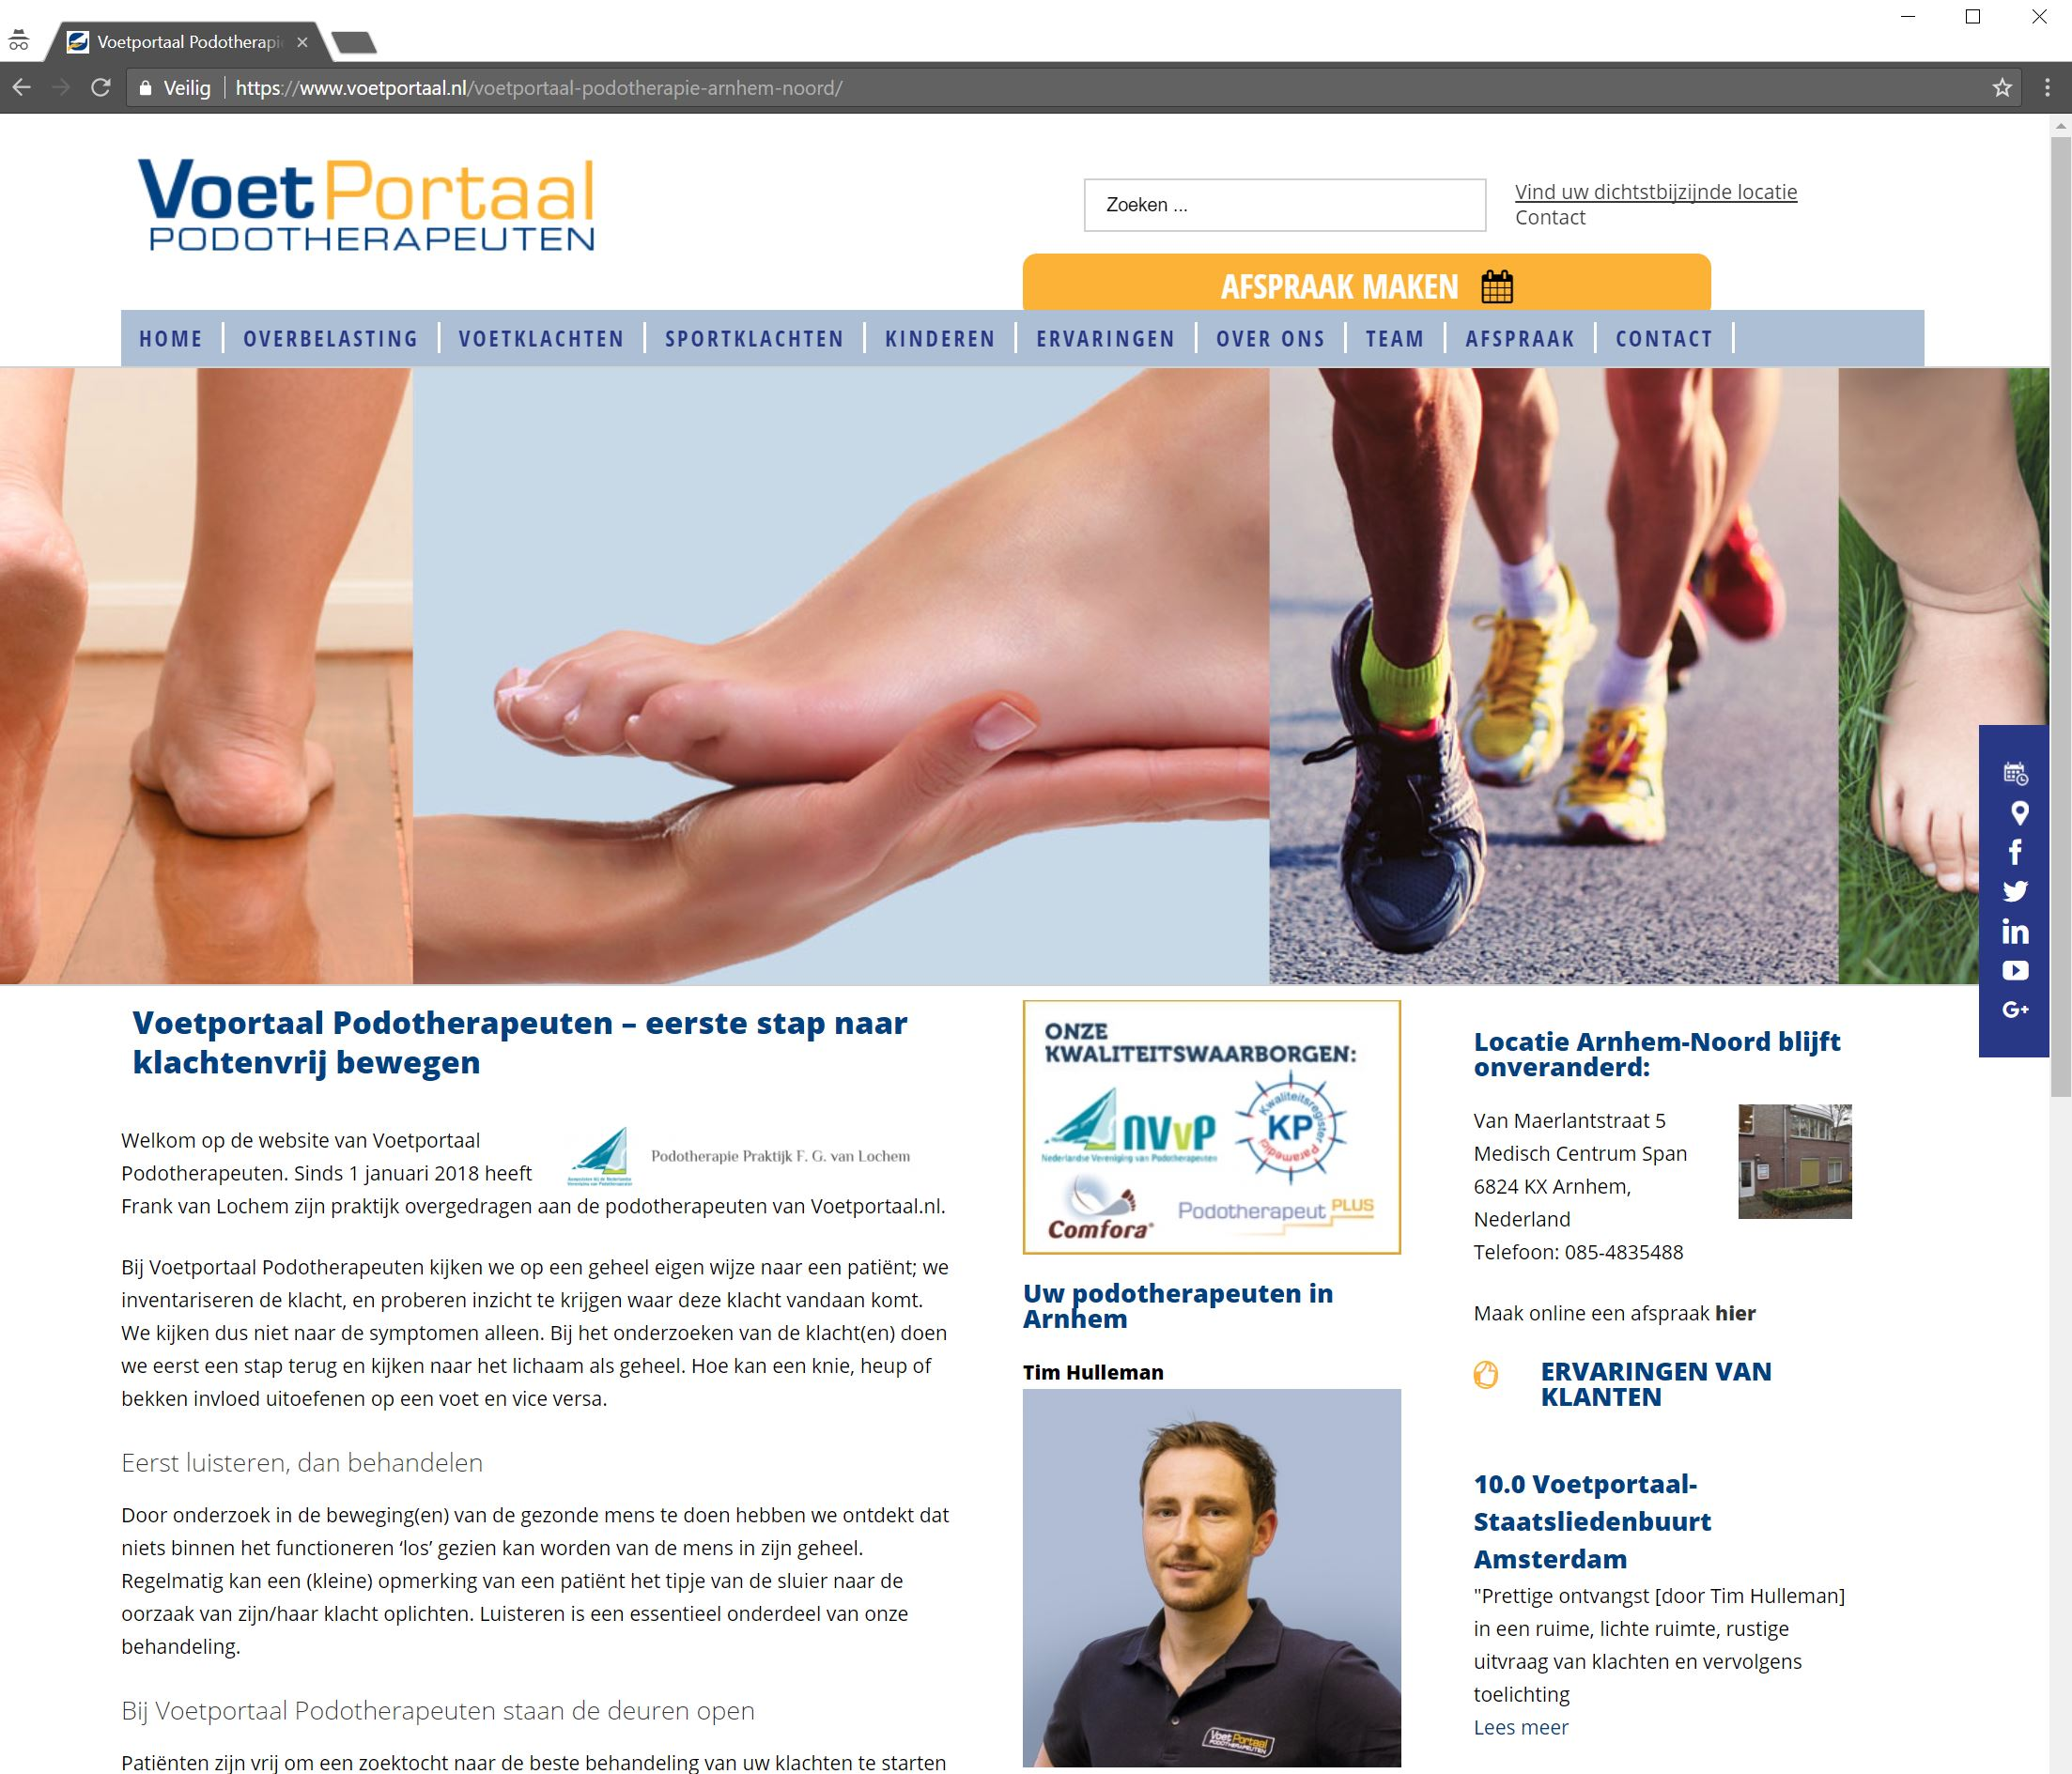 voetportaal-podotherapie-arnhem-noord